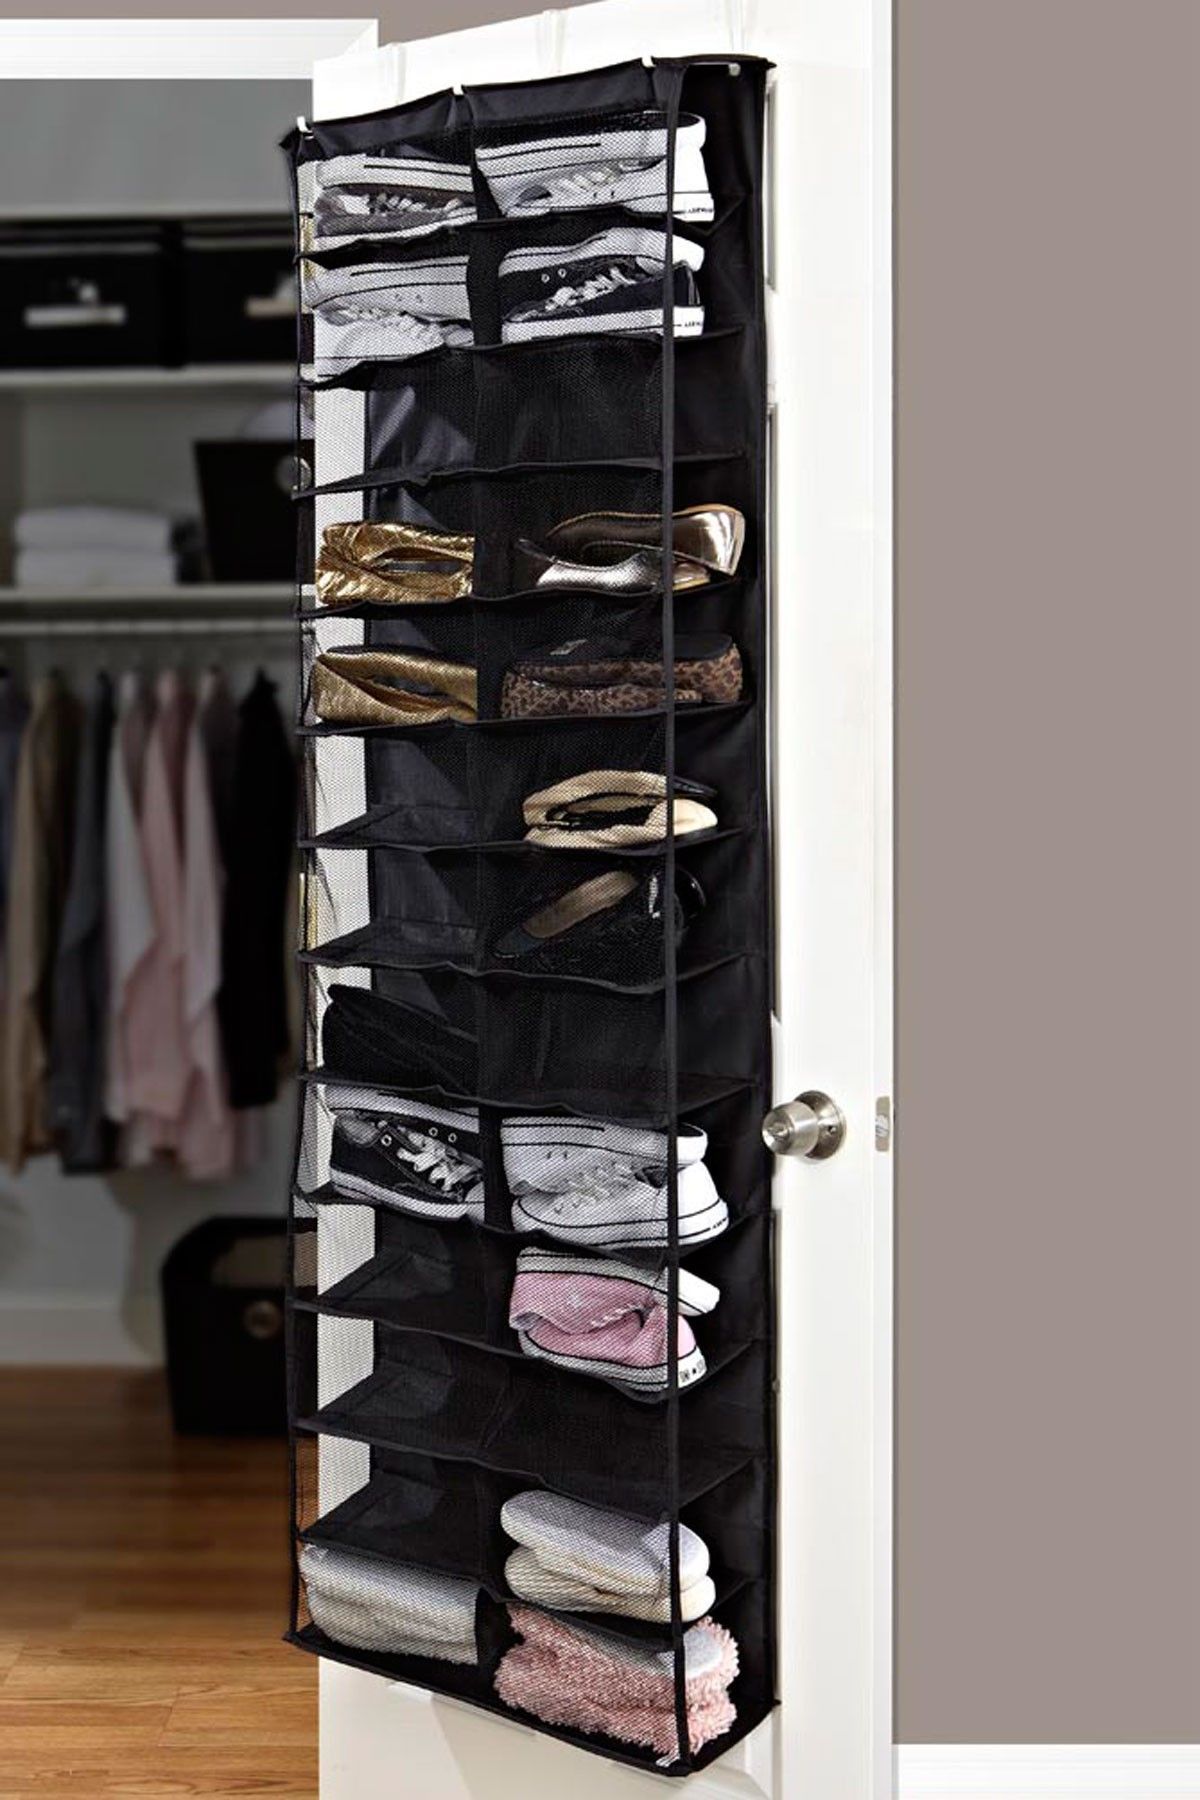 shoes furniture. 26 Pocket Over The Door Shoe Organizer - Black OrganizerHome #Furniture Shoes Furniture